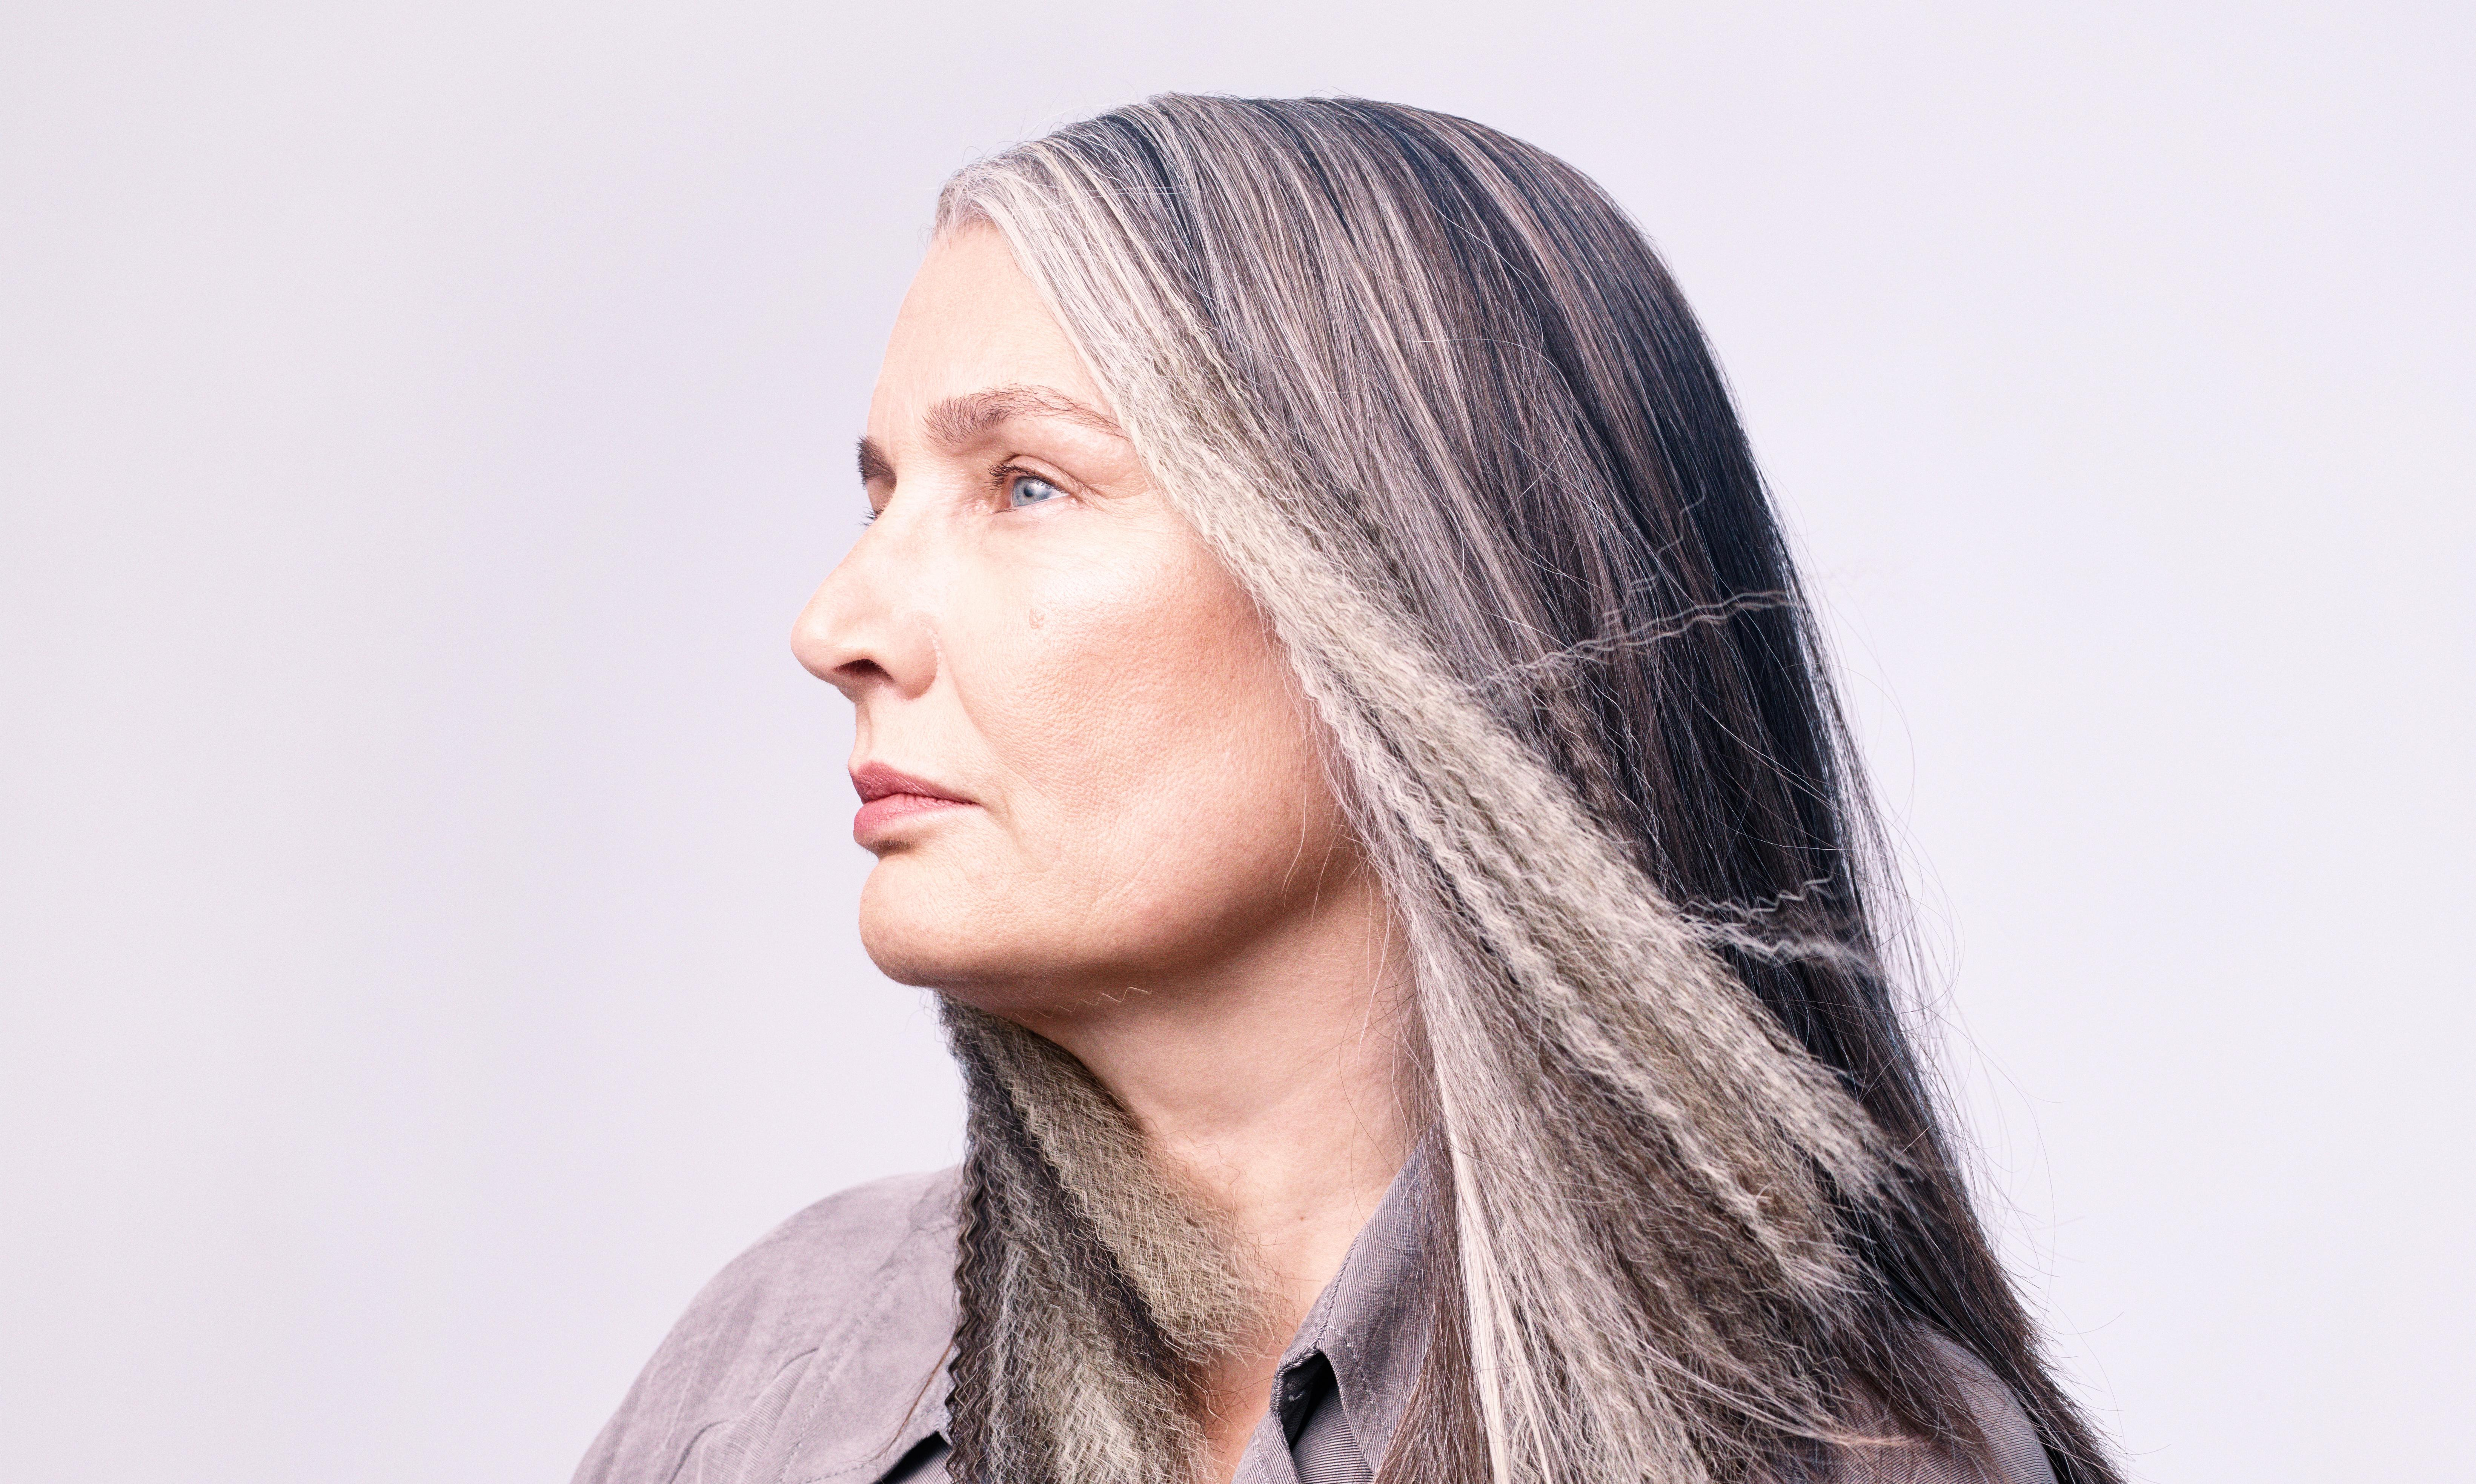 Award-winning columnist Deborah Orr dies aged 57